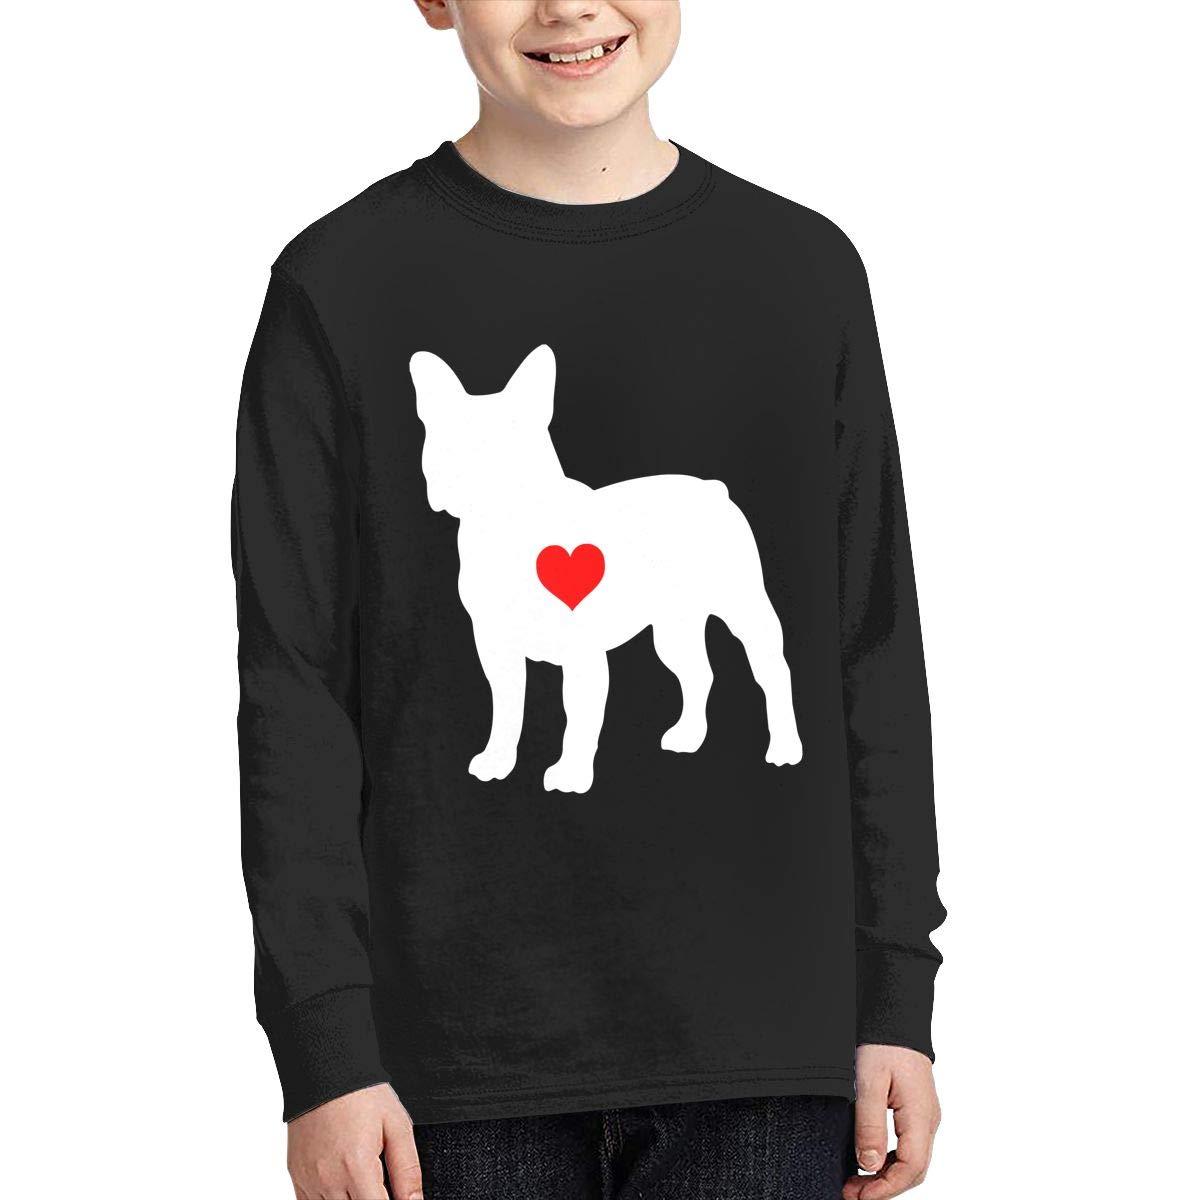 Teenagers Teen Boy French Bulldog with Heart-1 Printed Long Sleeve 100/% Cotton Tee Shirt